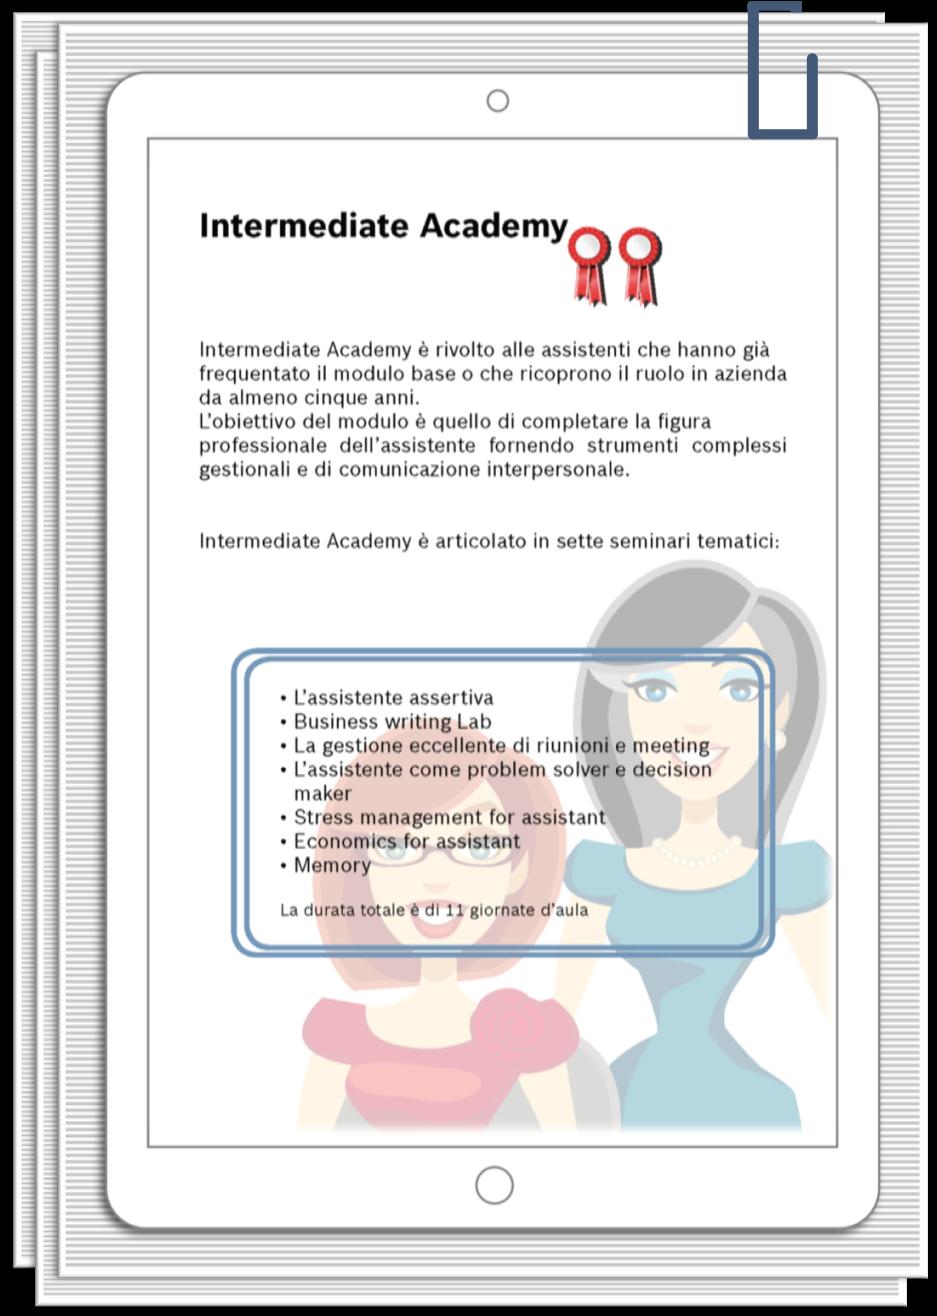 IreneLinguari_AssistenteDallaAallaZeta_About_Irene_02_Formazione_Assistente_A_SecretaryAcademy_Int_prog